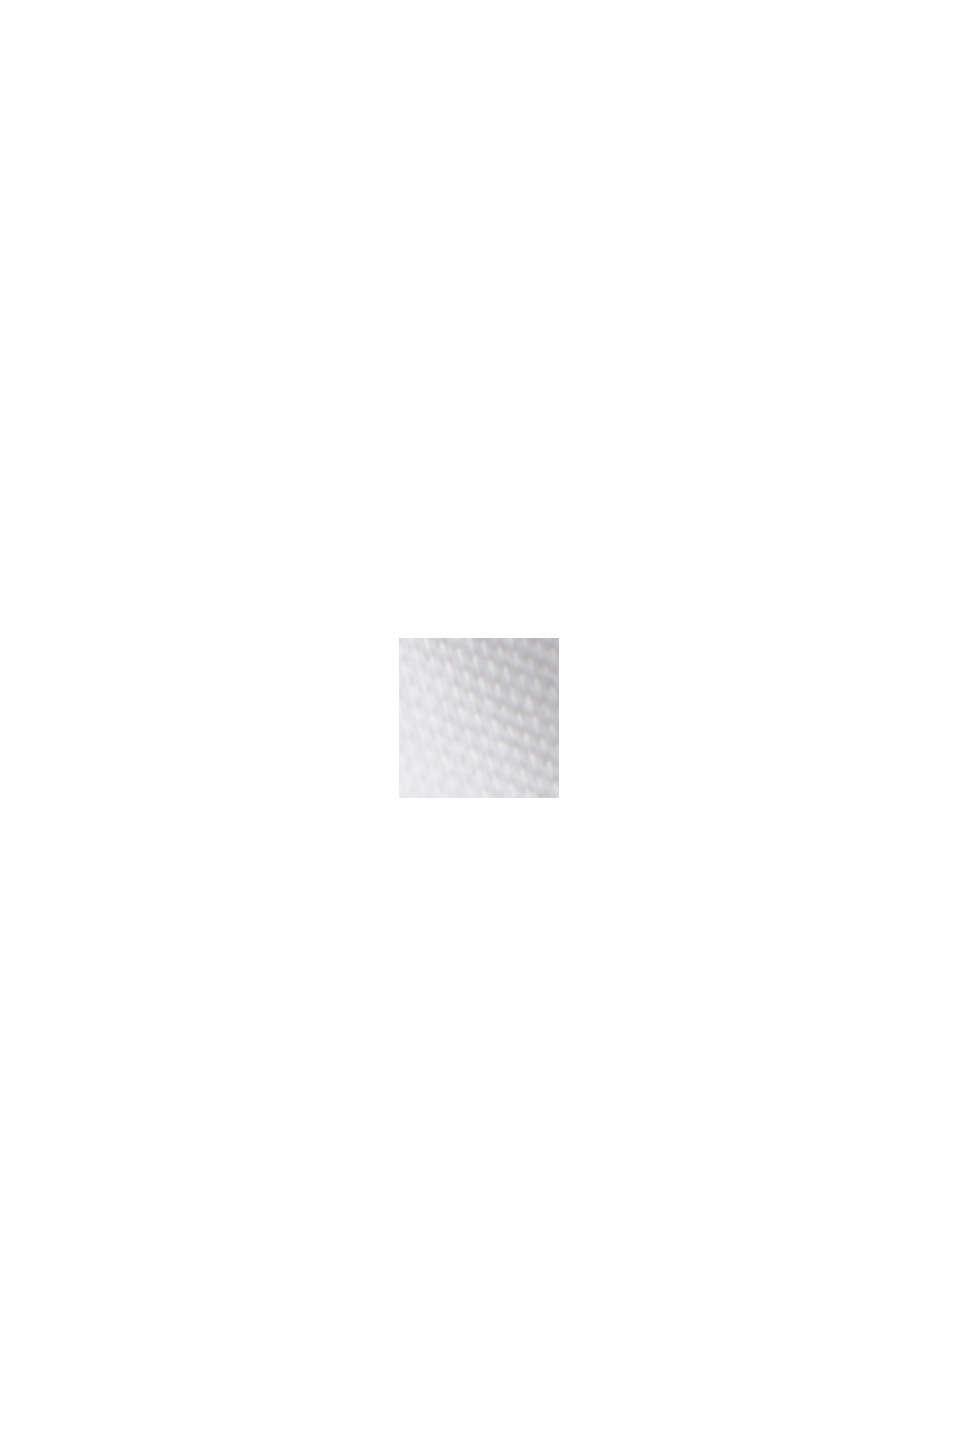 TENNIS piké polokošile s bio bavlnou, WHITE, swatch